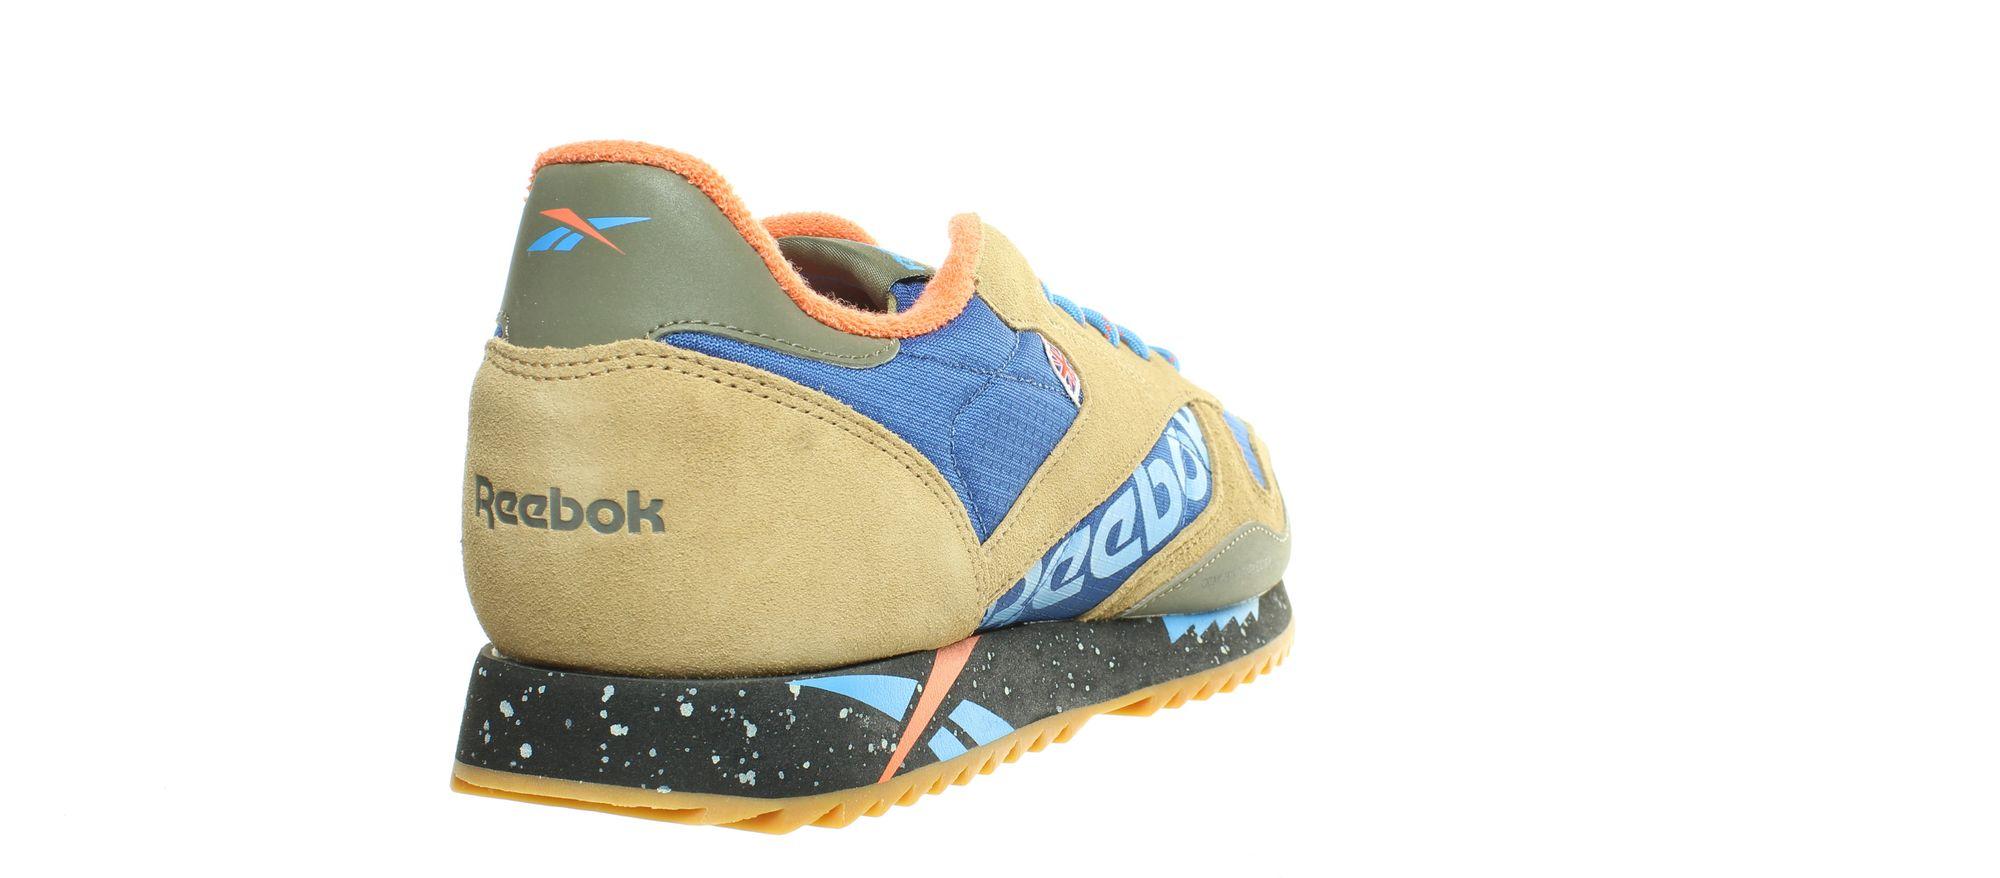 Reebok-Mens-Classic-Leather-Ripple-Fashion-Sneakers thumbnail 8